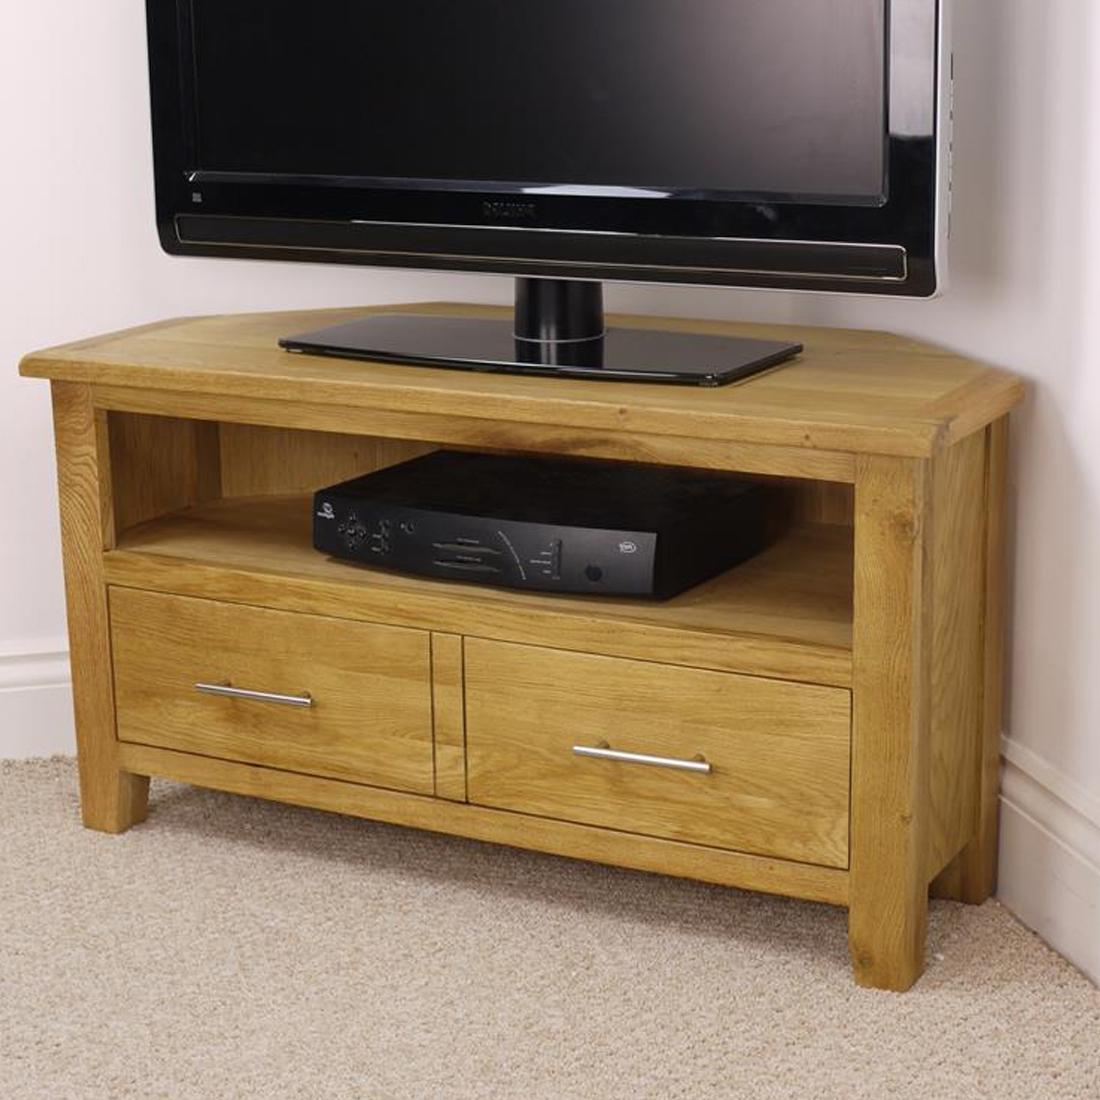 Most Popular Corner Tv Stand Oak Effect – Corner Designs Intended For Oak Effect Corner Tv Stand (View 4 of 20)